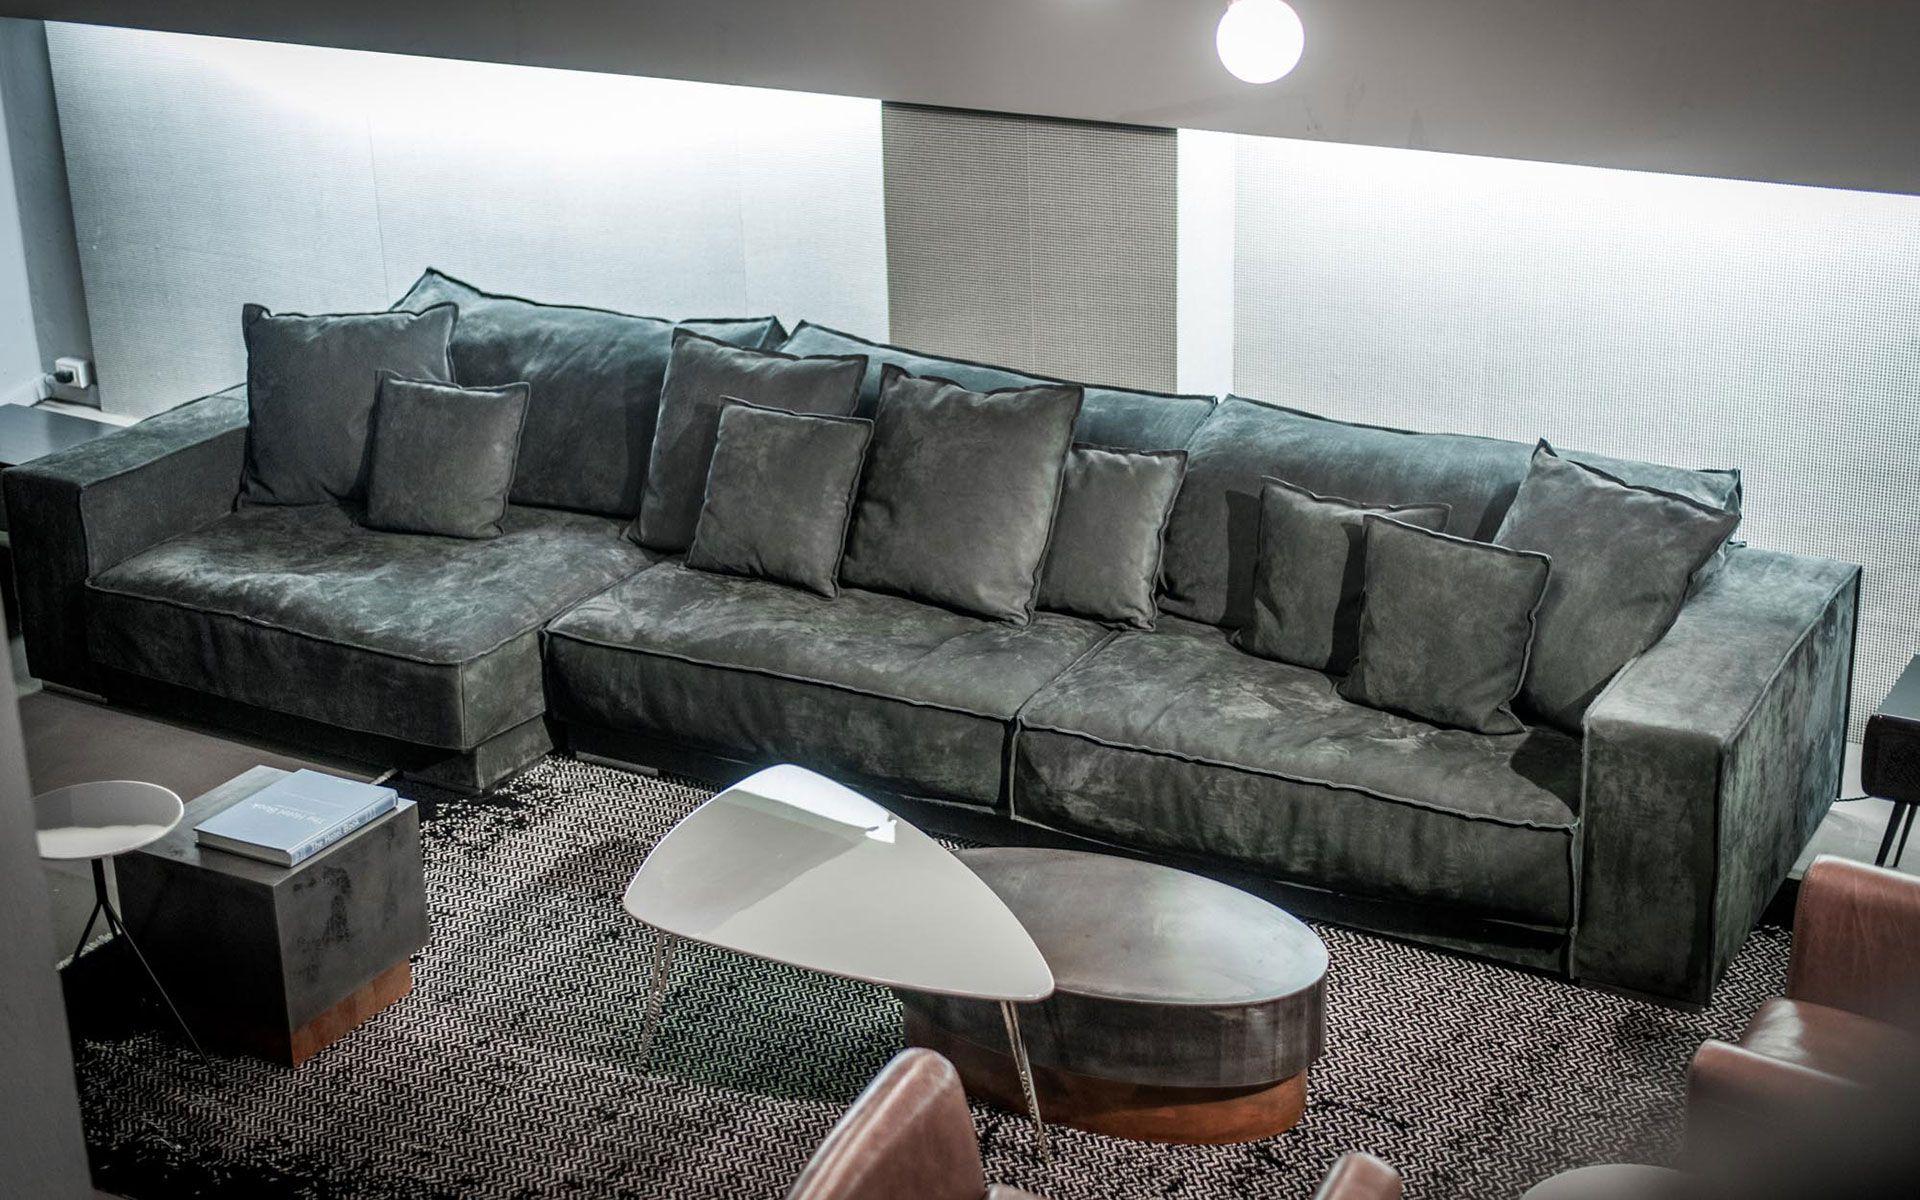 scarlet twill baxter nel 2019 divano baxter divano e